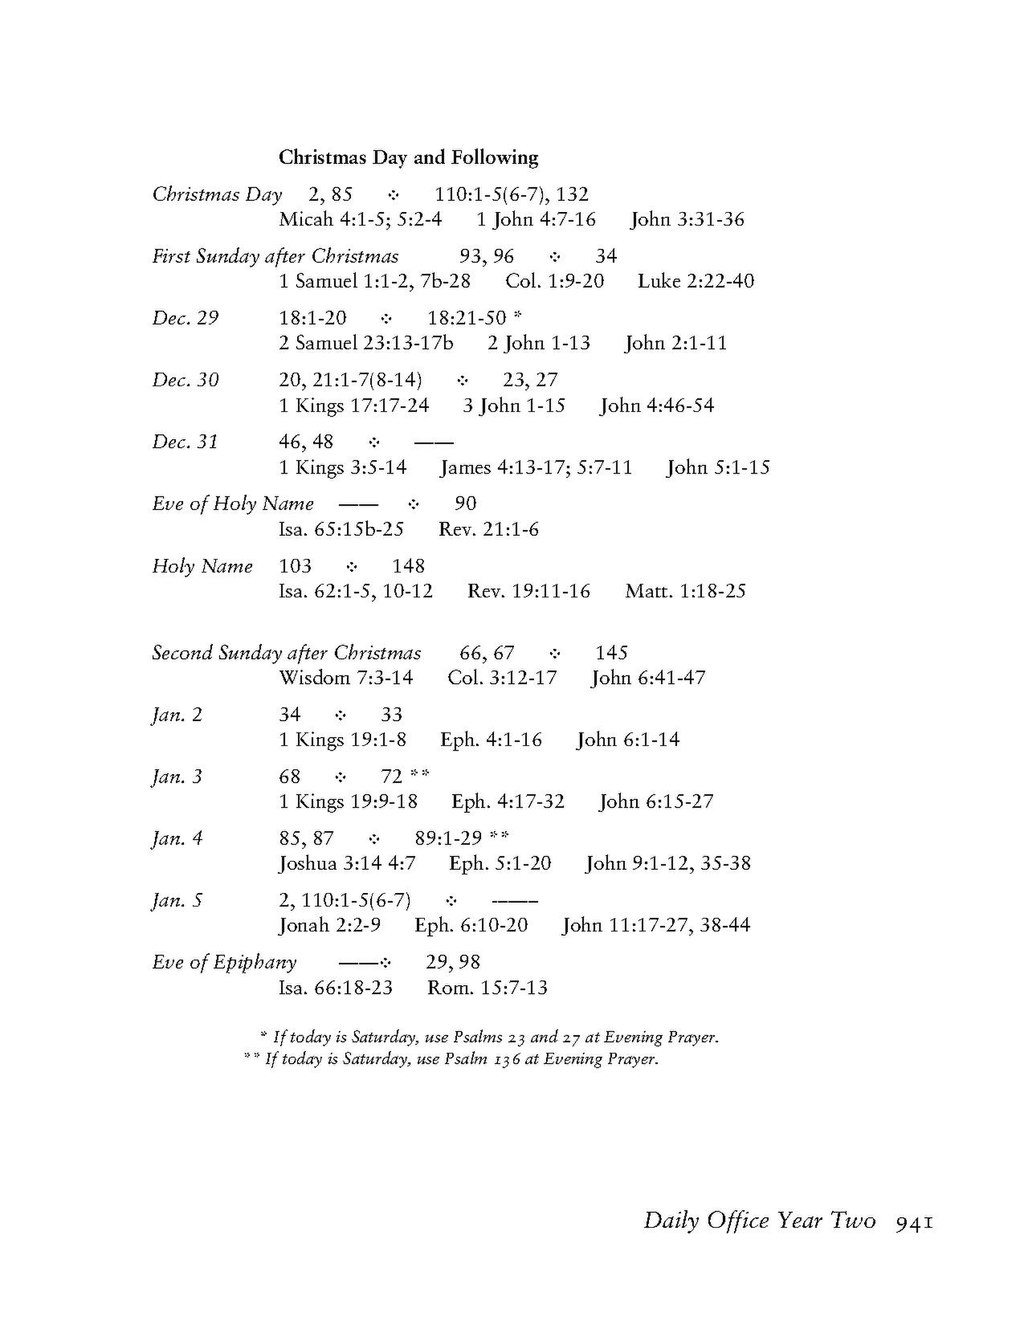 Page Book Of Common Prayer Tec 941